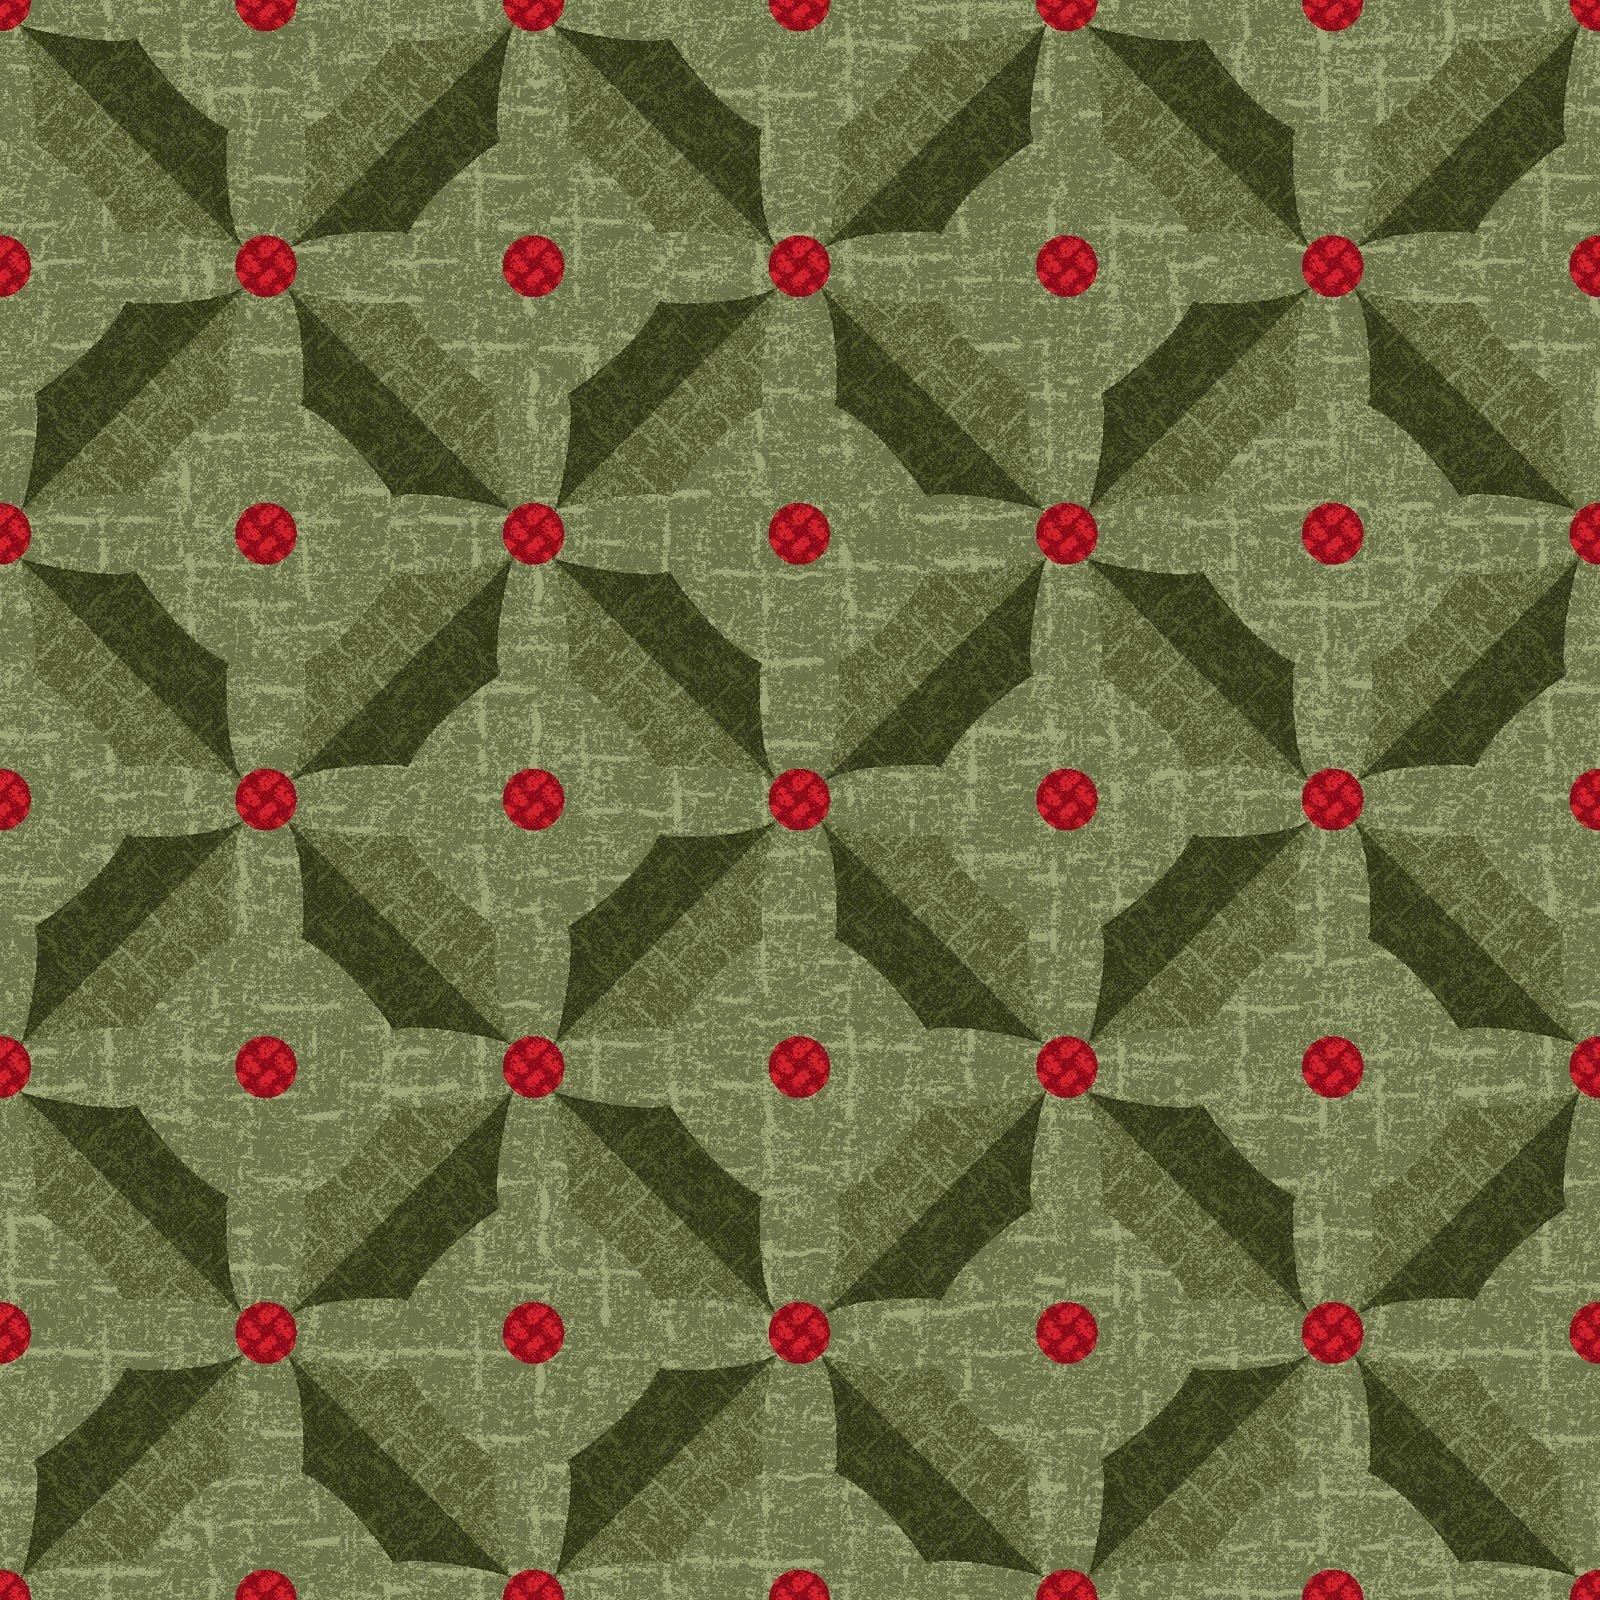 Green Holly - Snowdays Flannel by Bonnie Sullivan - MASF9935-G